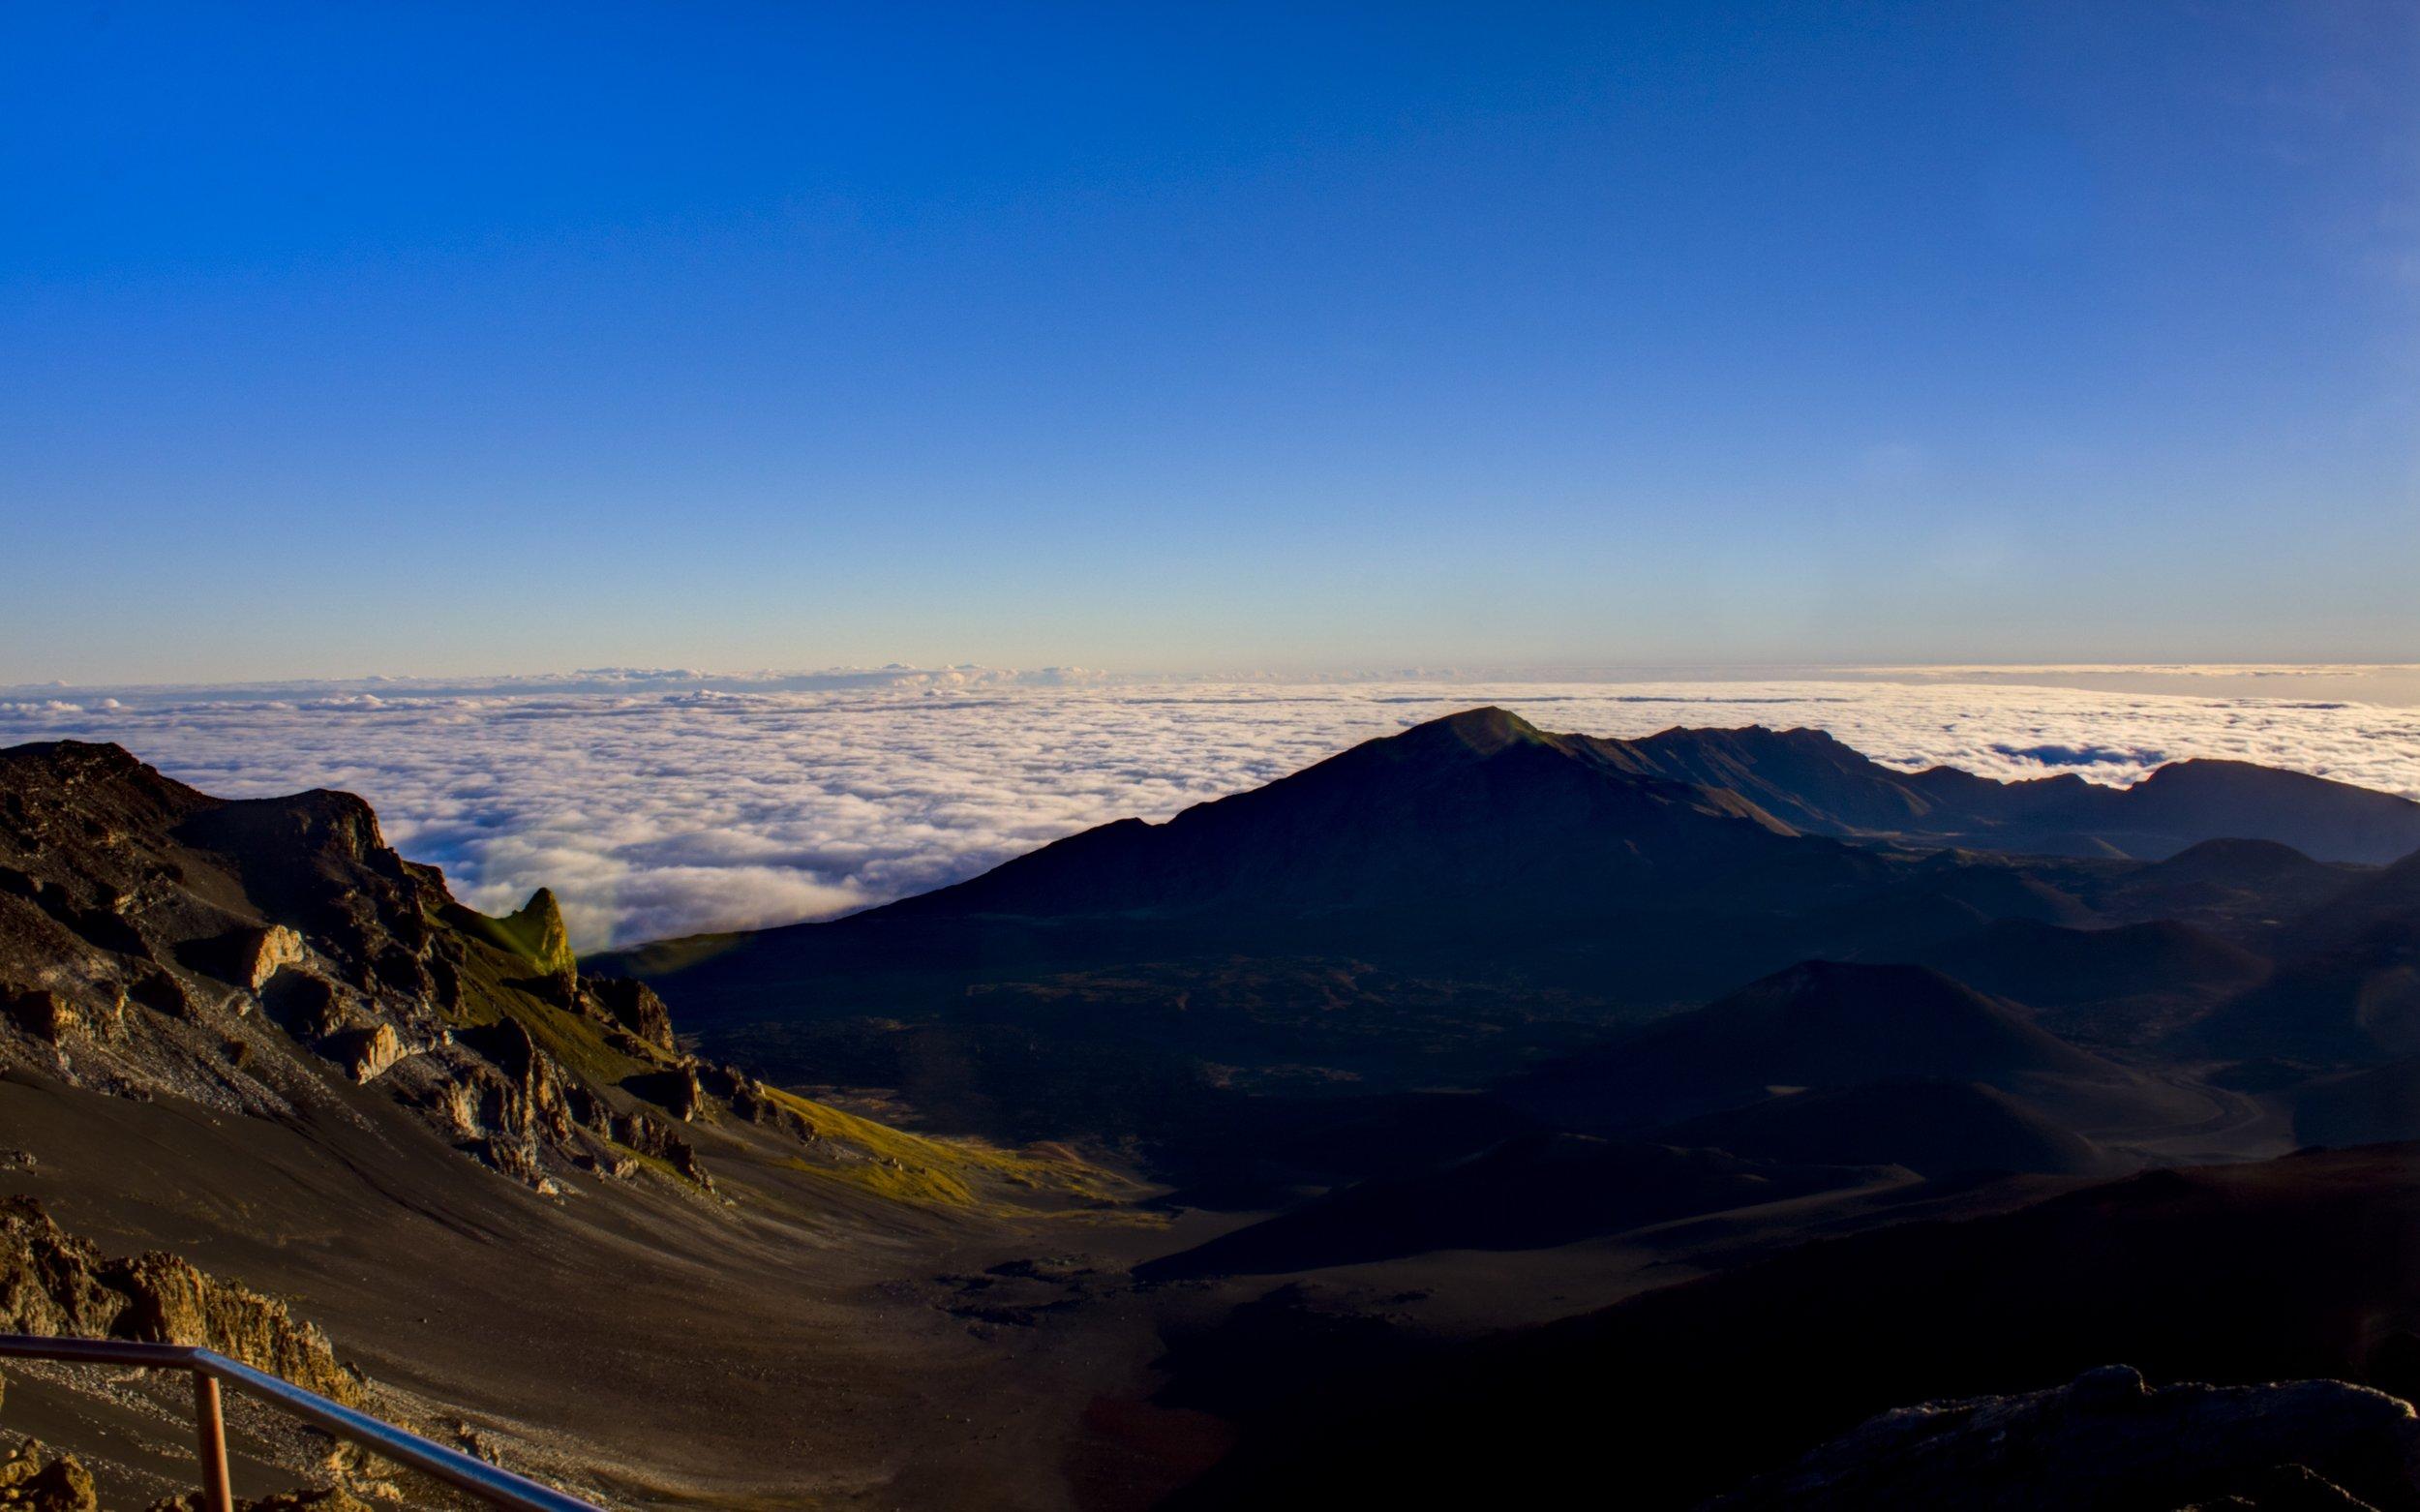 Sunrise at Haleakala Summit - Things to do in Maui, Hawaii